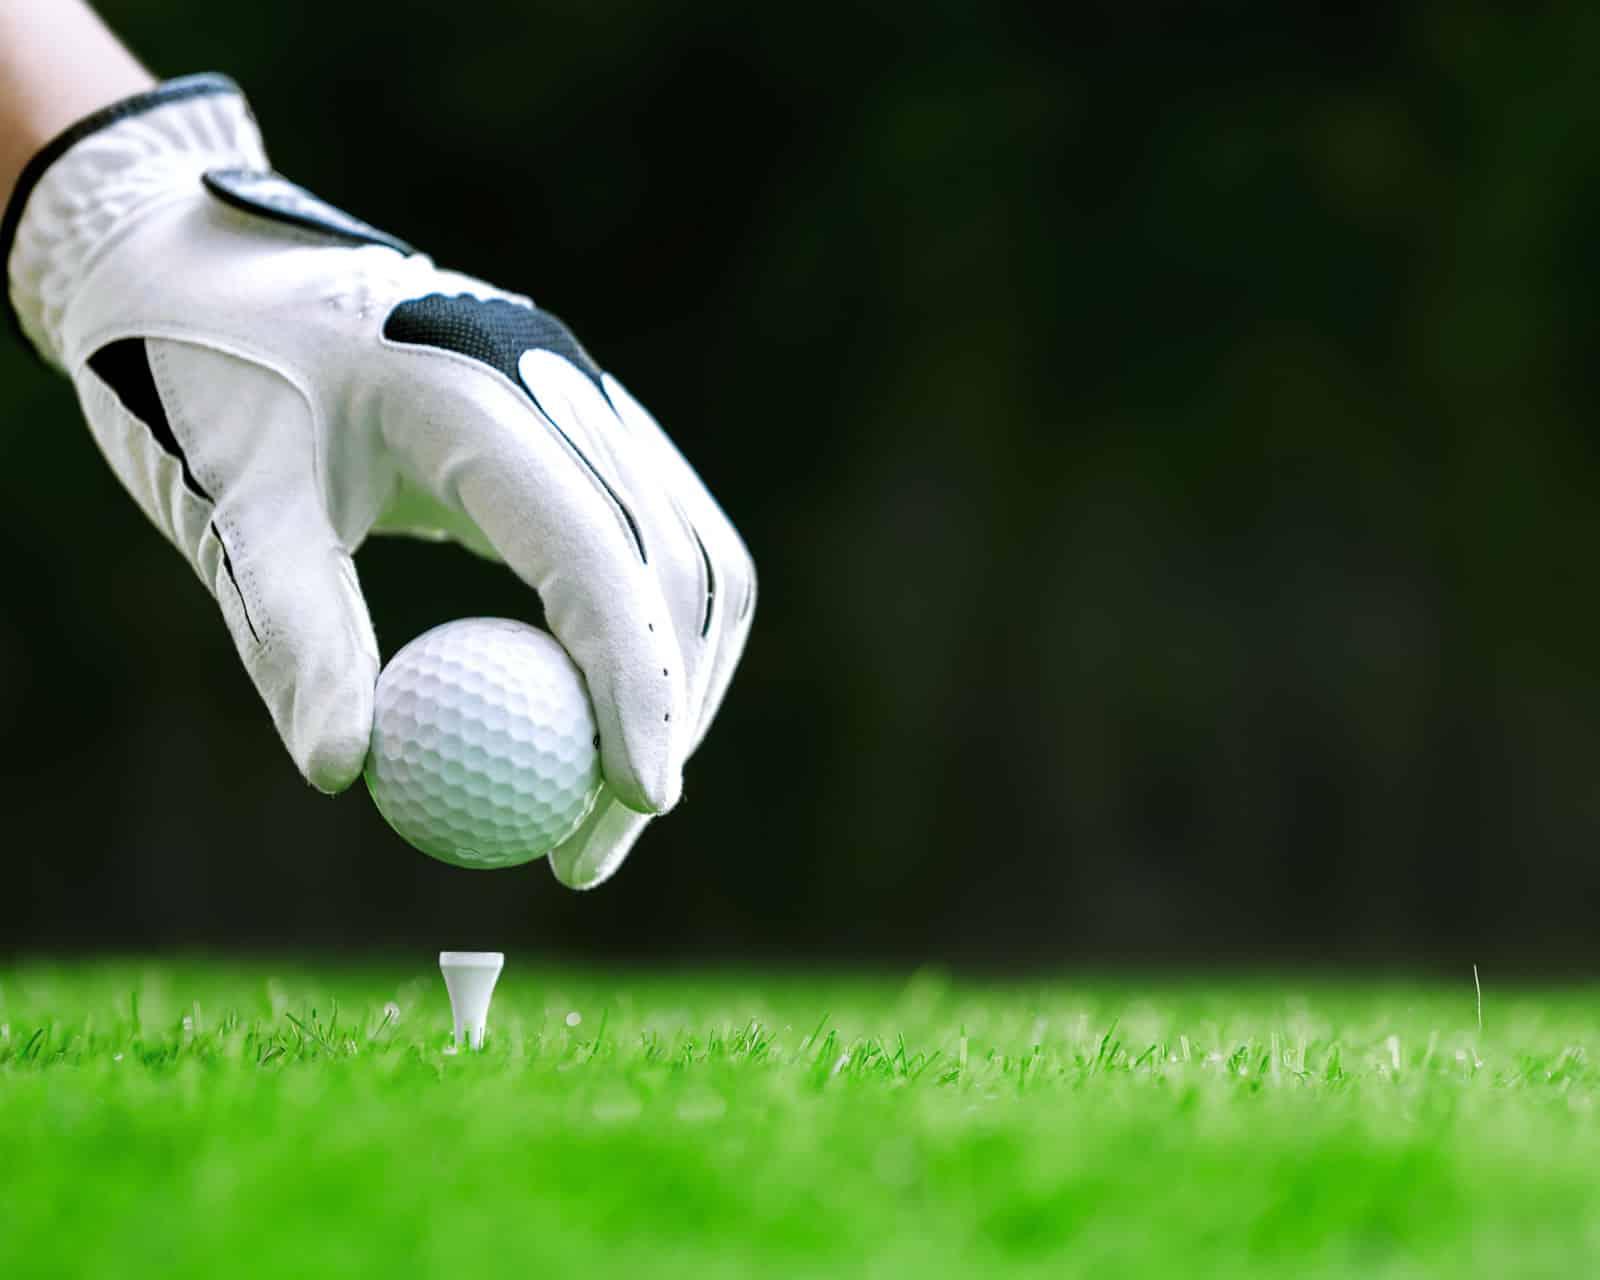 mora-spring-brook-golf-course